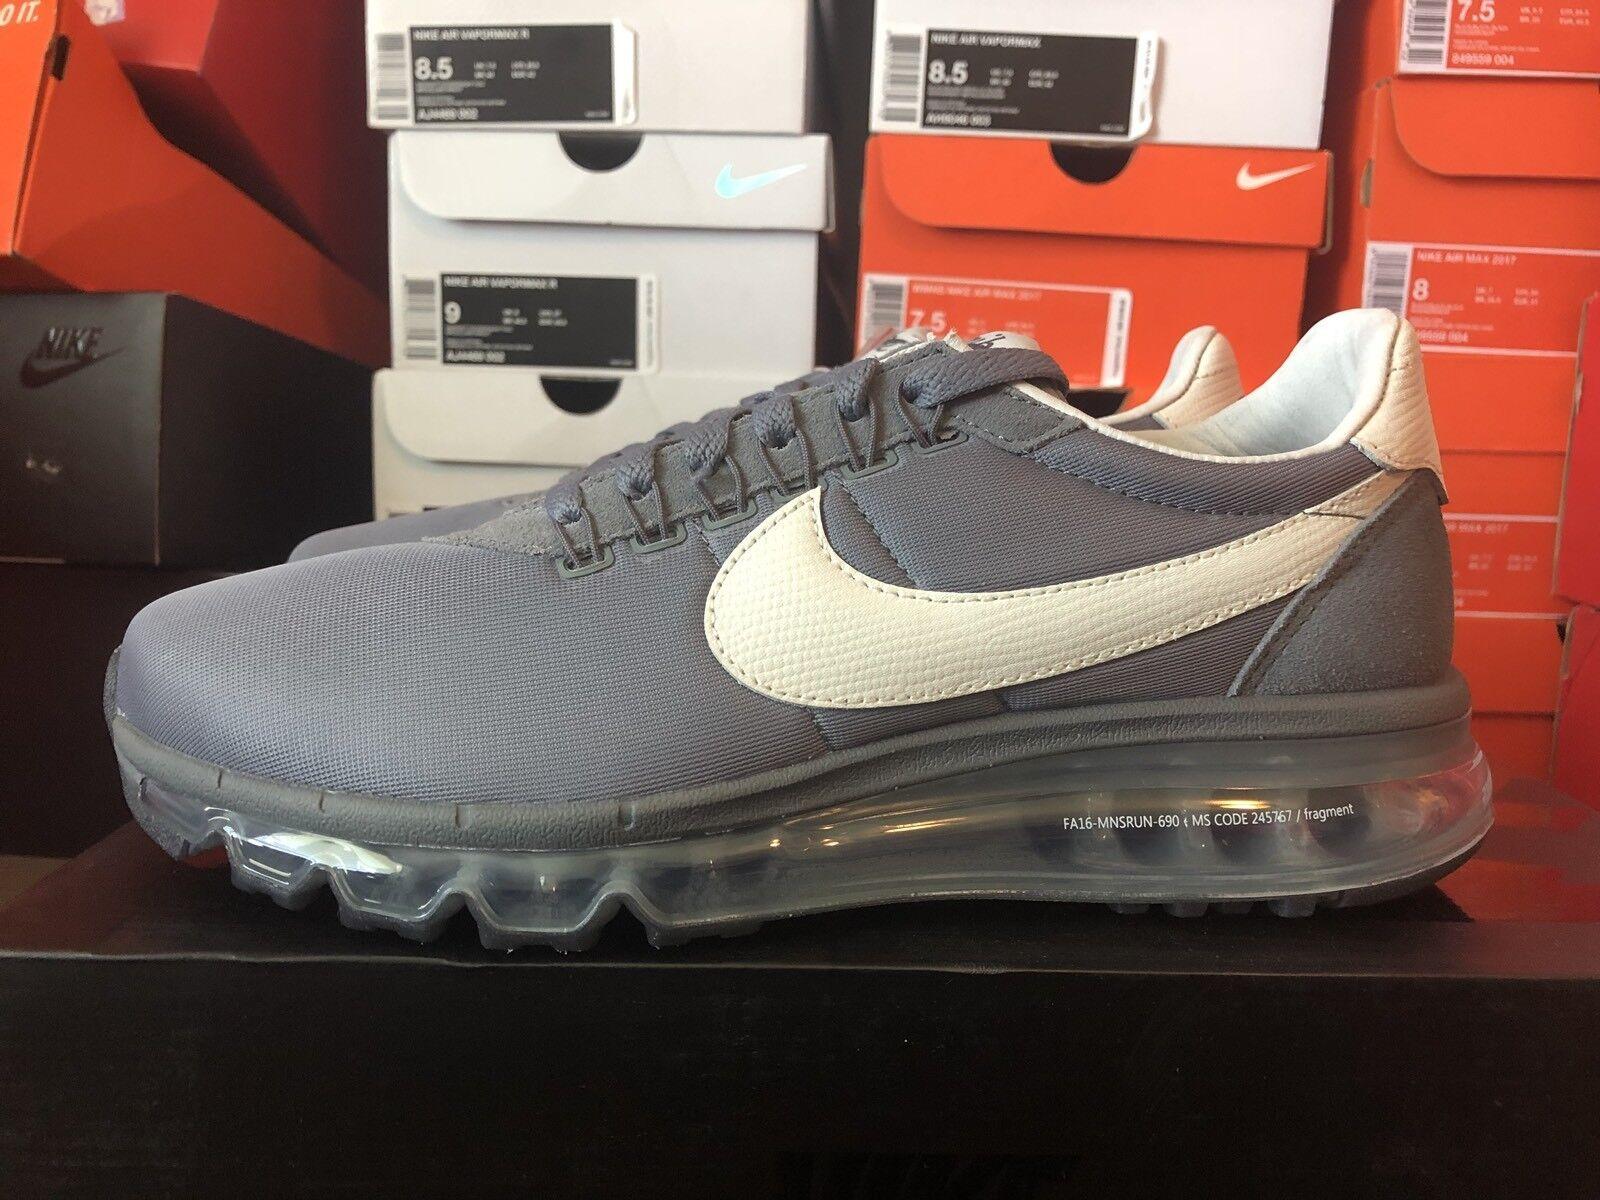 Nike air max ld-zero fragment hiroshi fujiwara grau - weiß sz - 9.